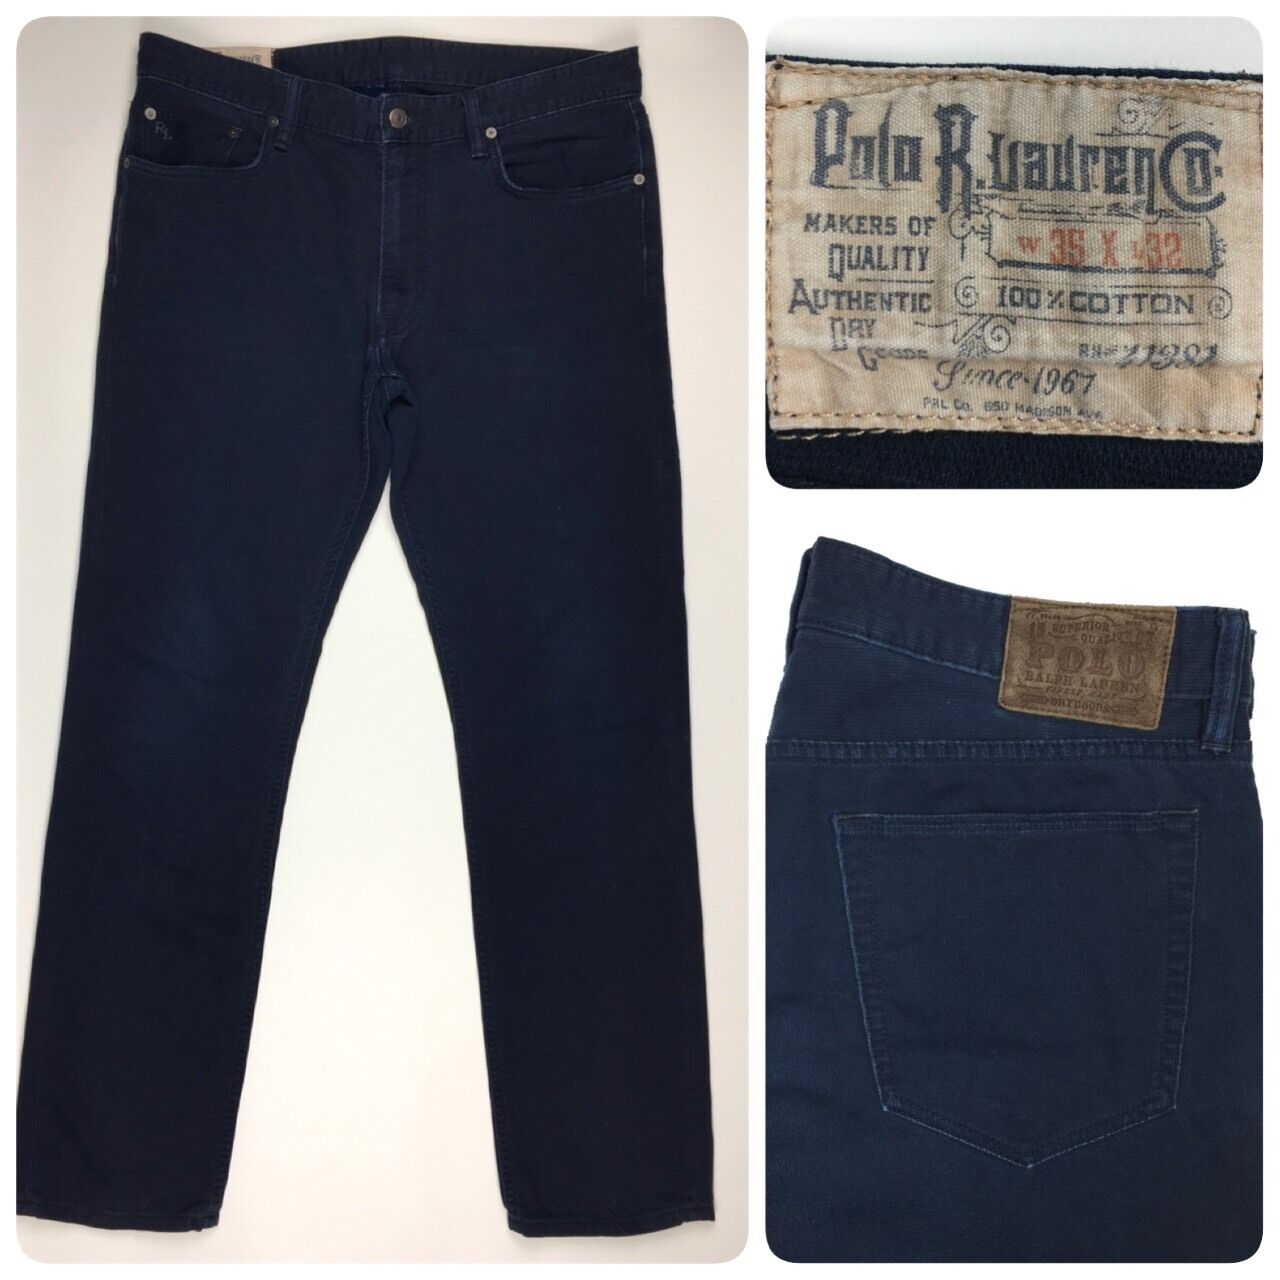 Polo Ralph Lauren Men's Straight Leg Navy bluee Corduroy Jean Pants 35x32